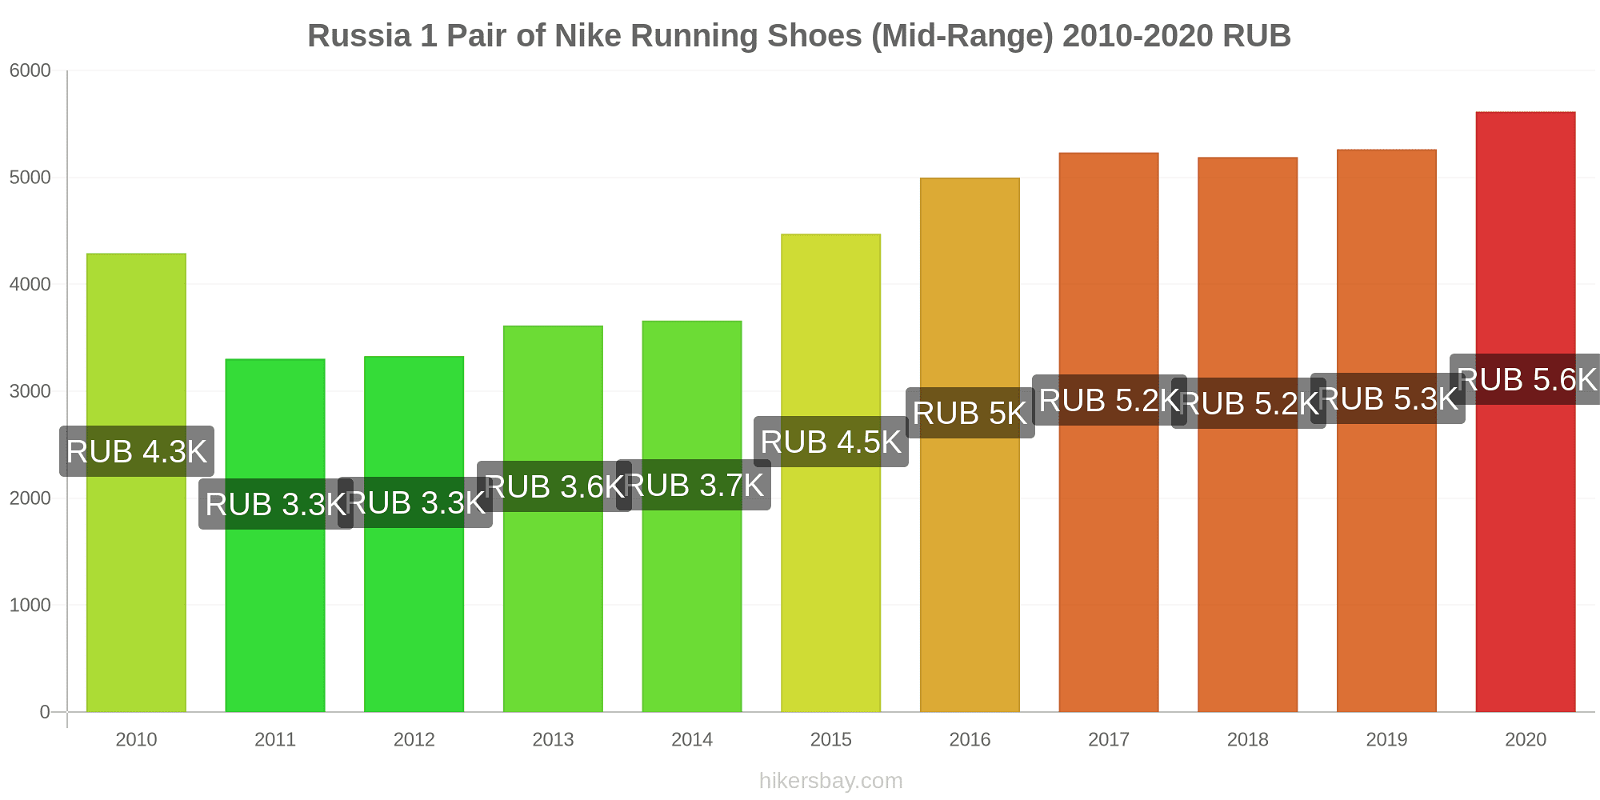 Russia price changes 1 Pair of Nike Running Shoes (Mid-Range) hikersbay.com